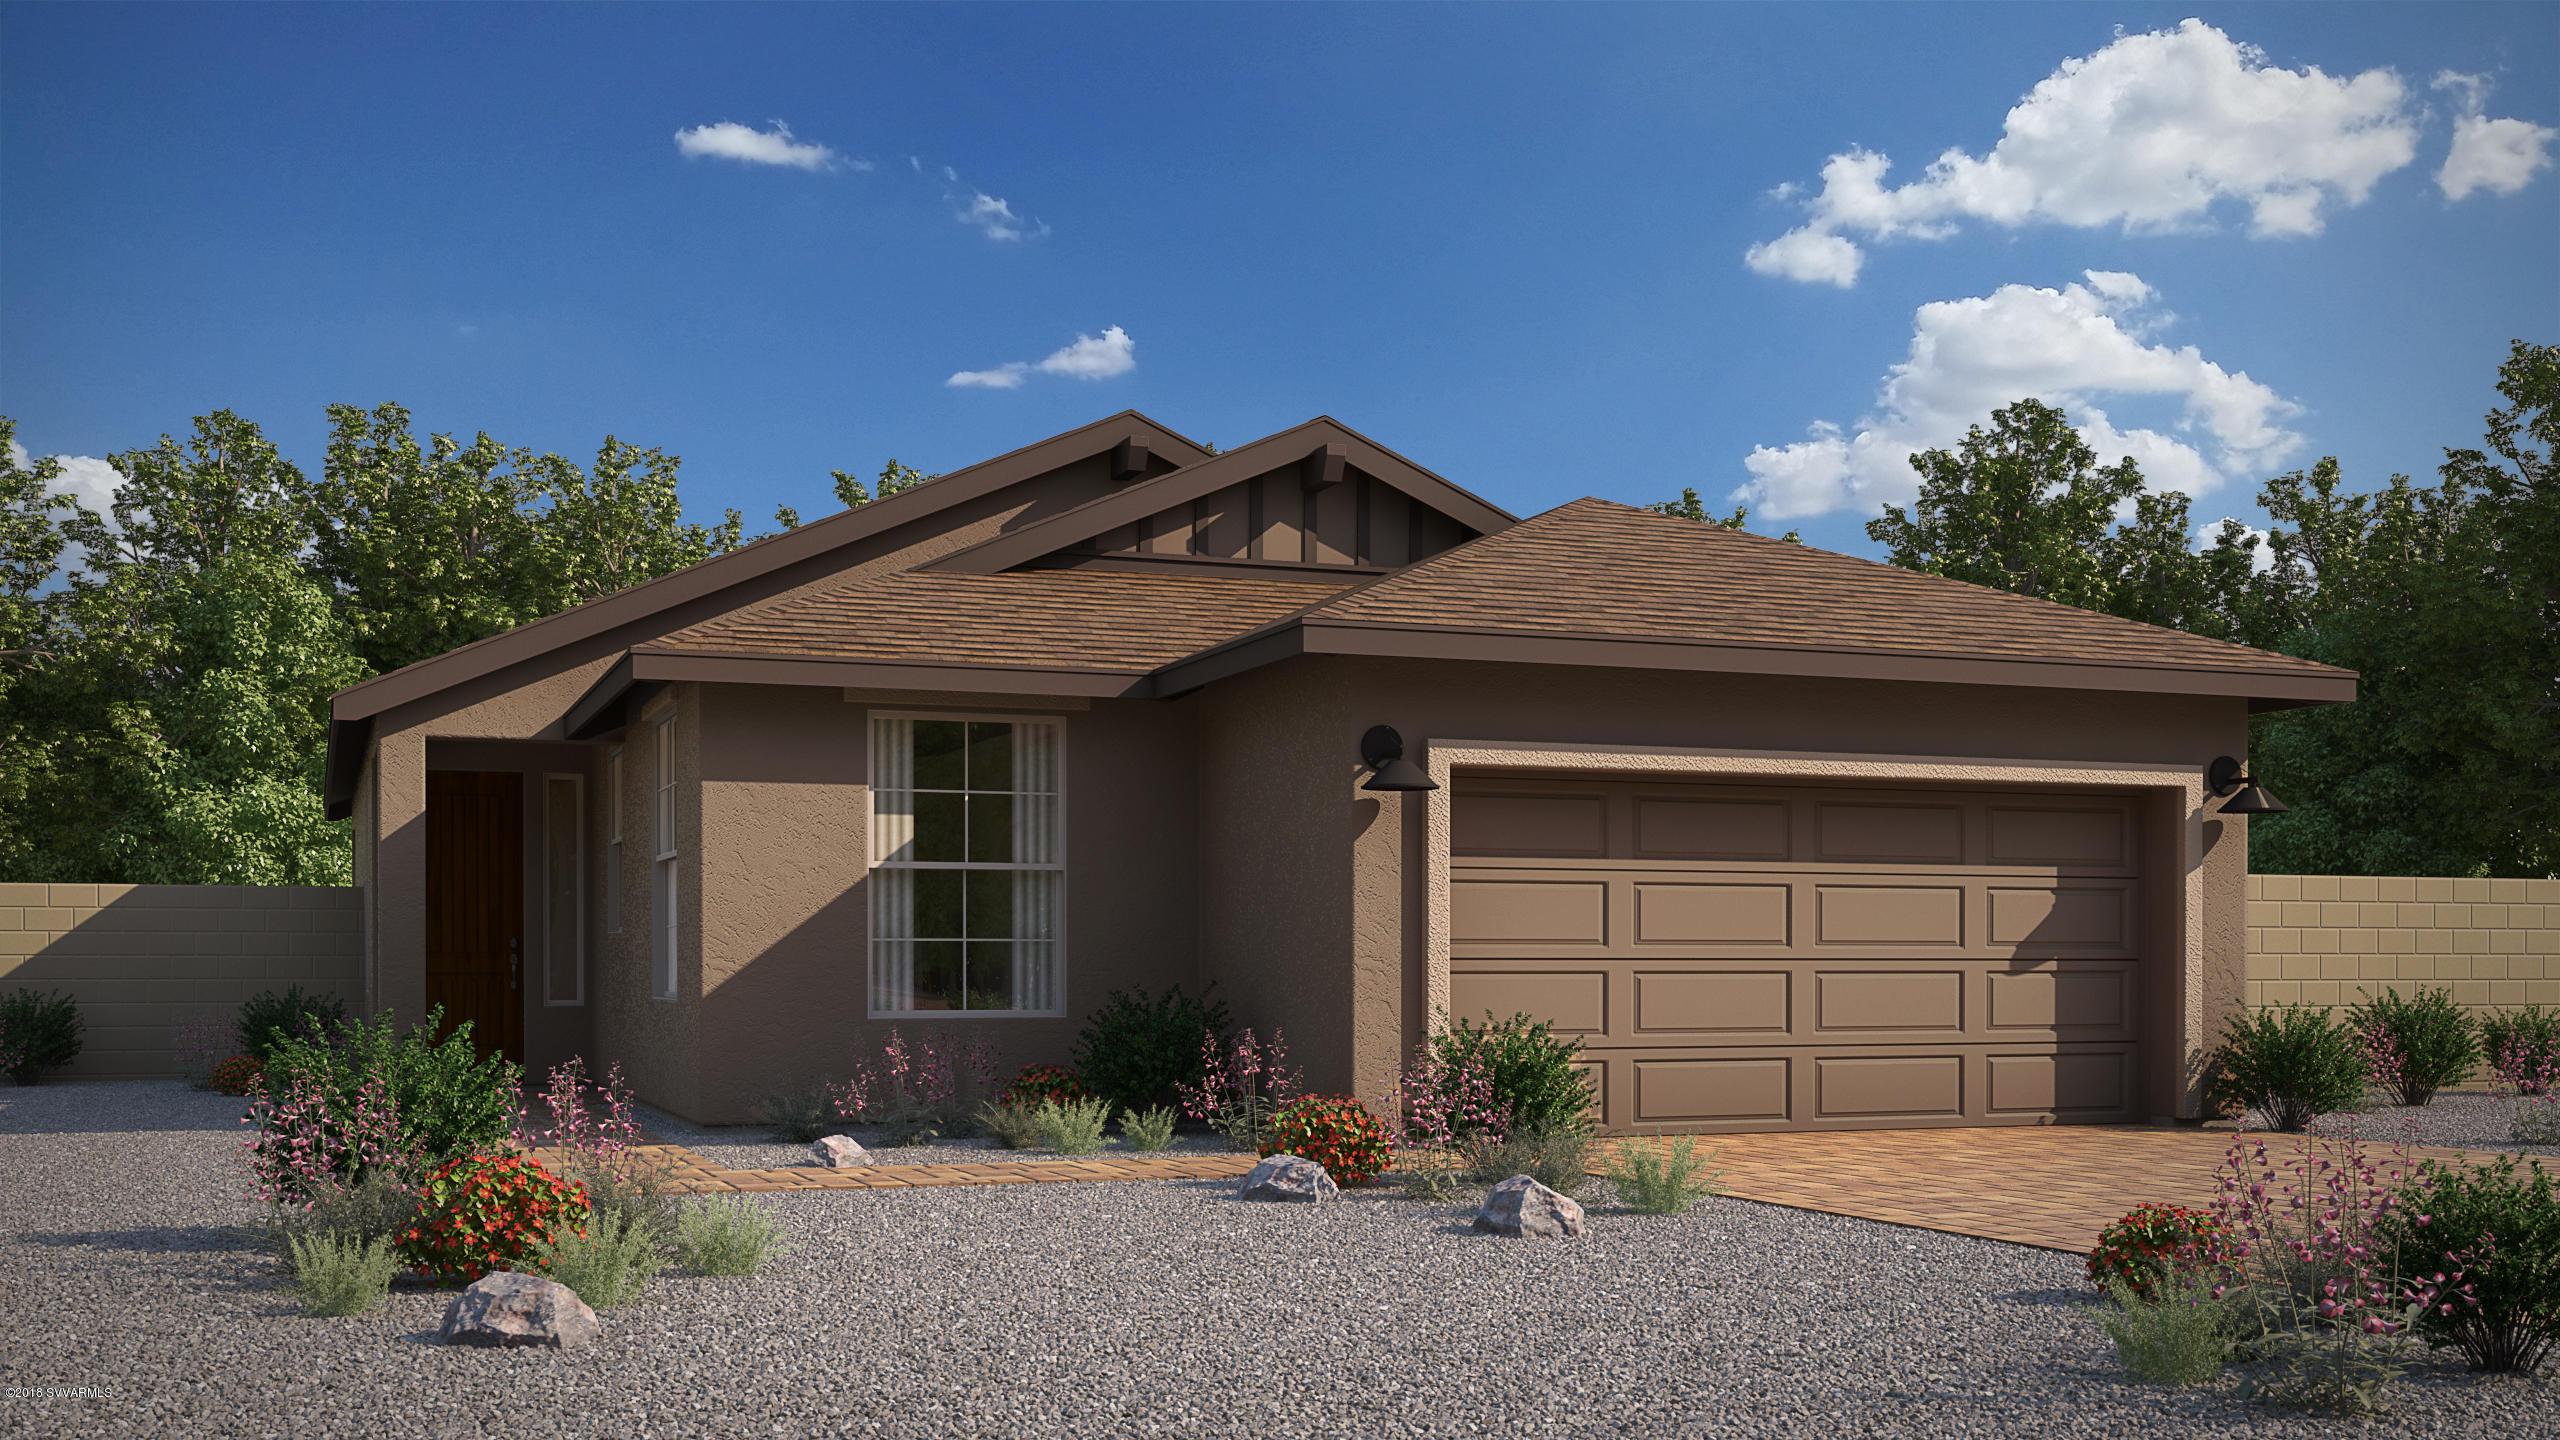 558 Ruffner Lane Clarkdale, AZ 86324